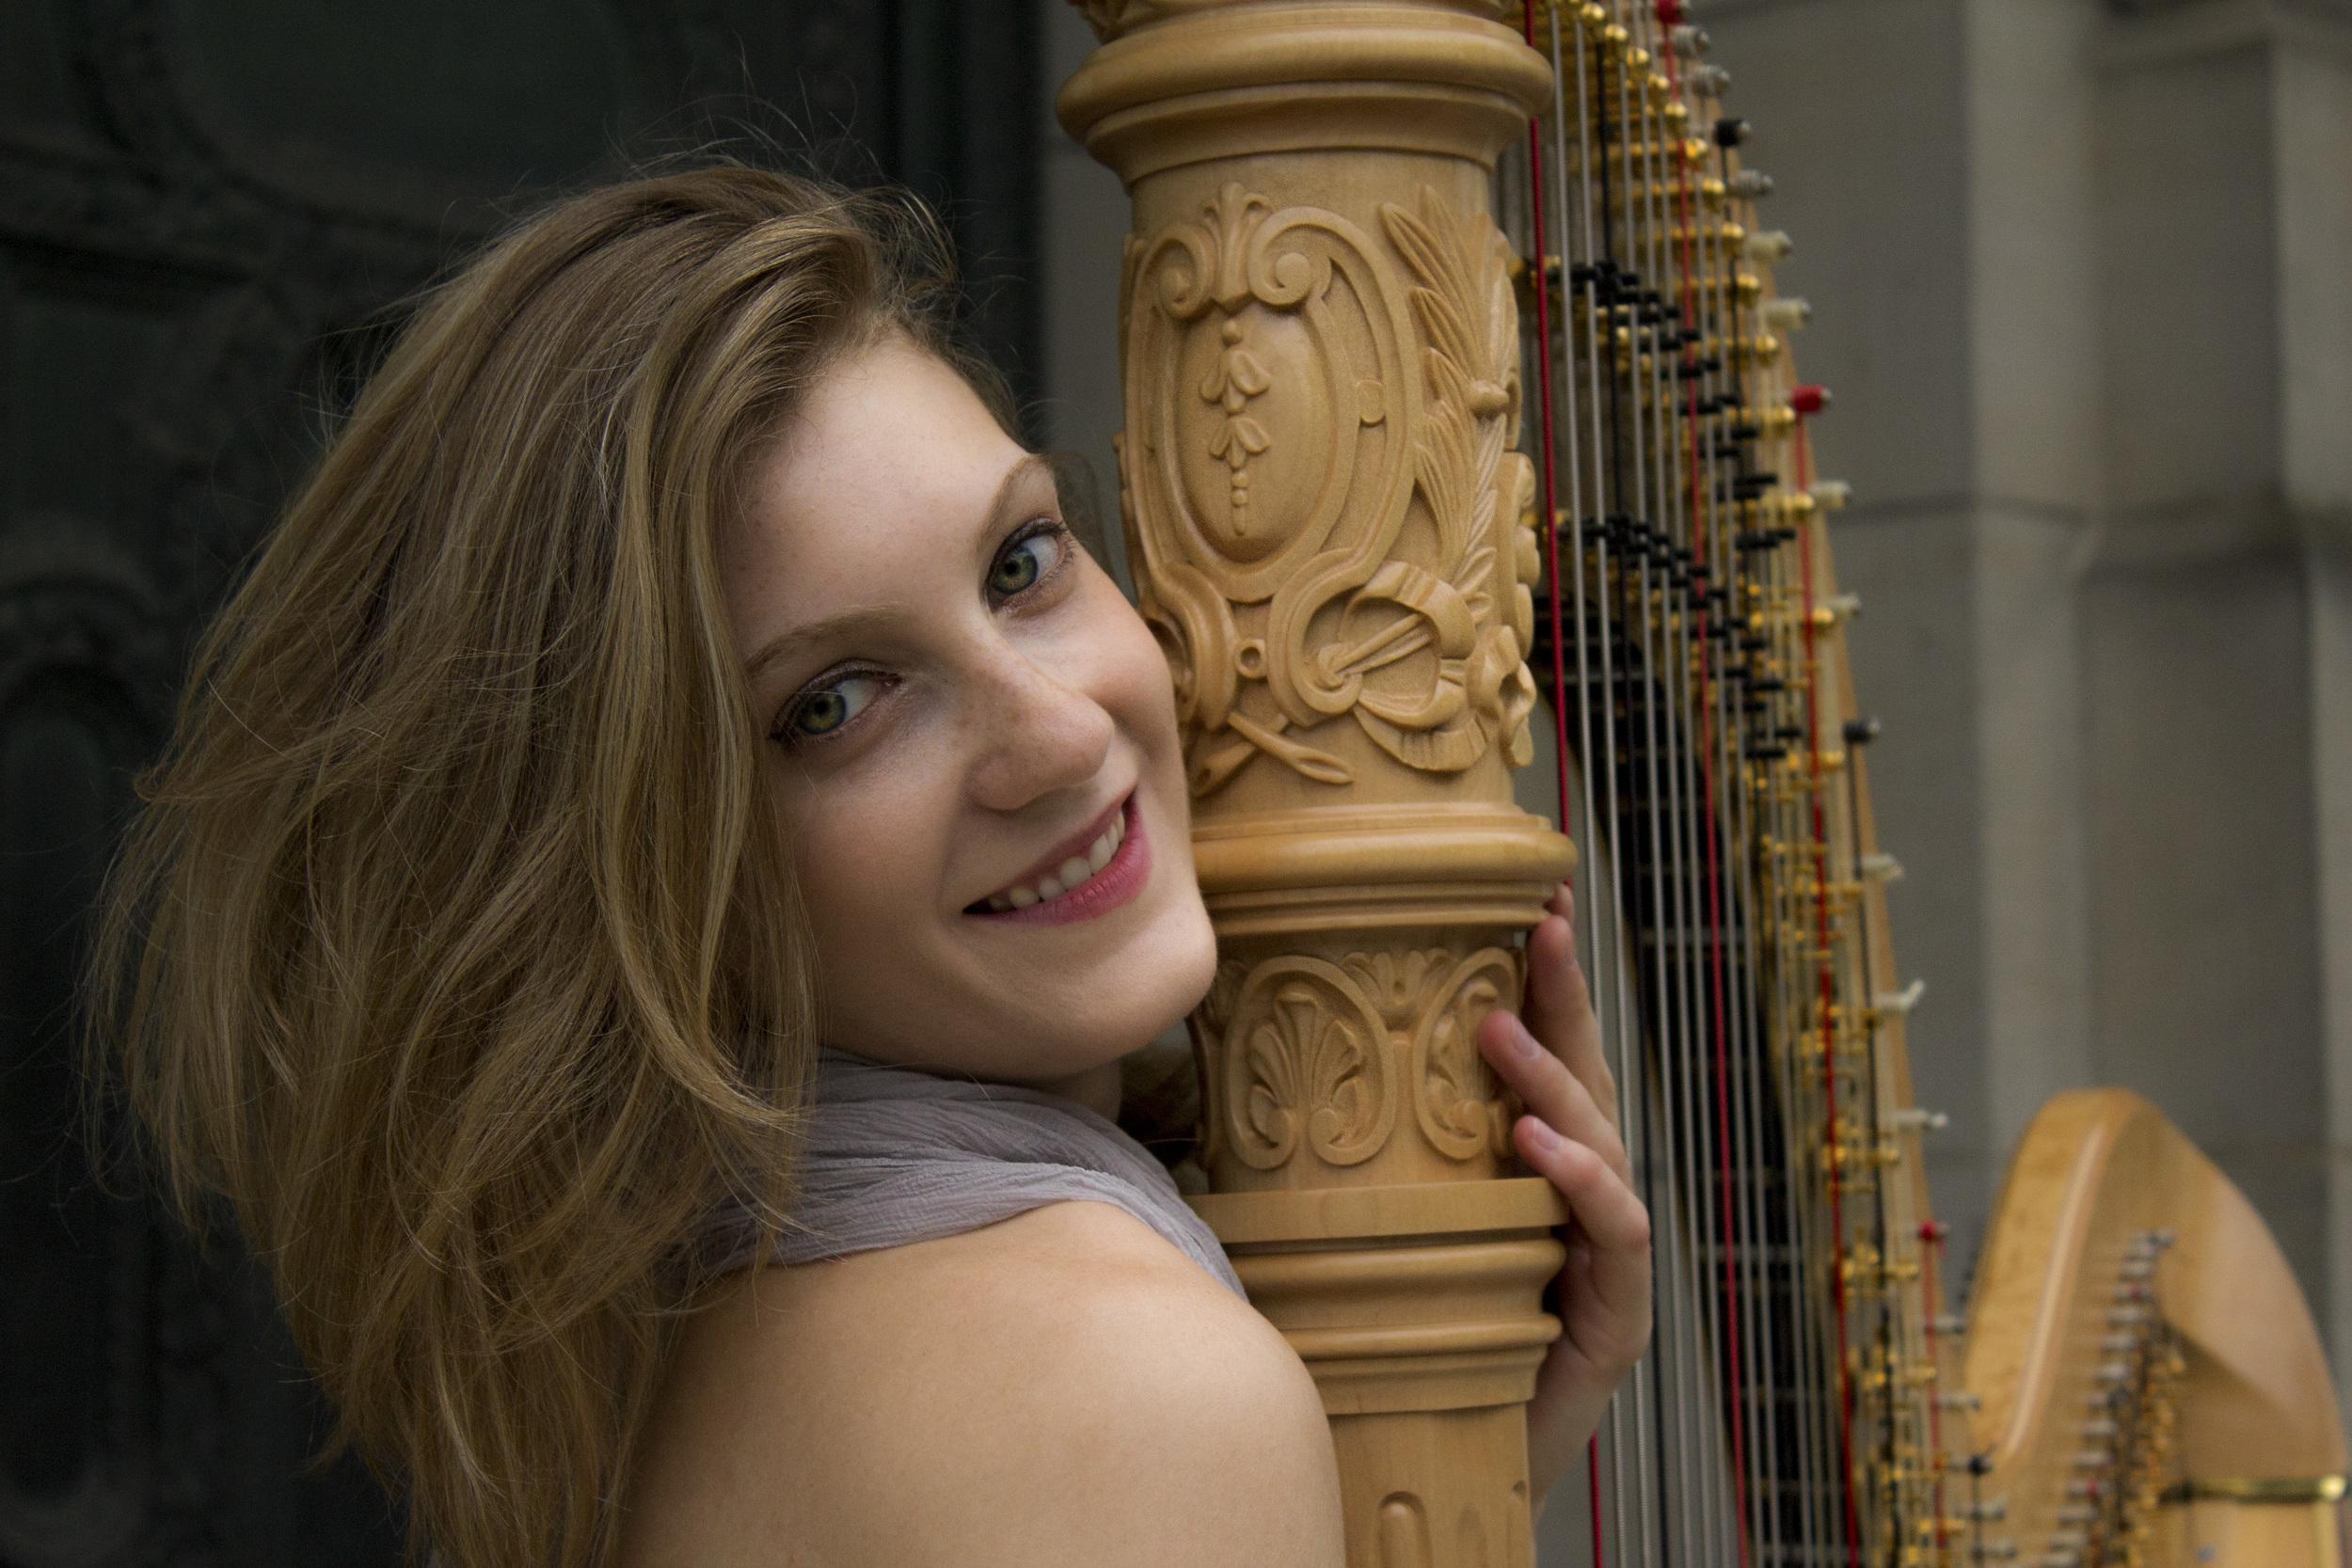 Chelsea Lane Harp Carnegie Hall Pgh Headshot with Harp Eyes.jpg